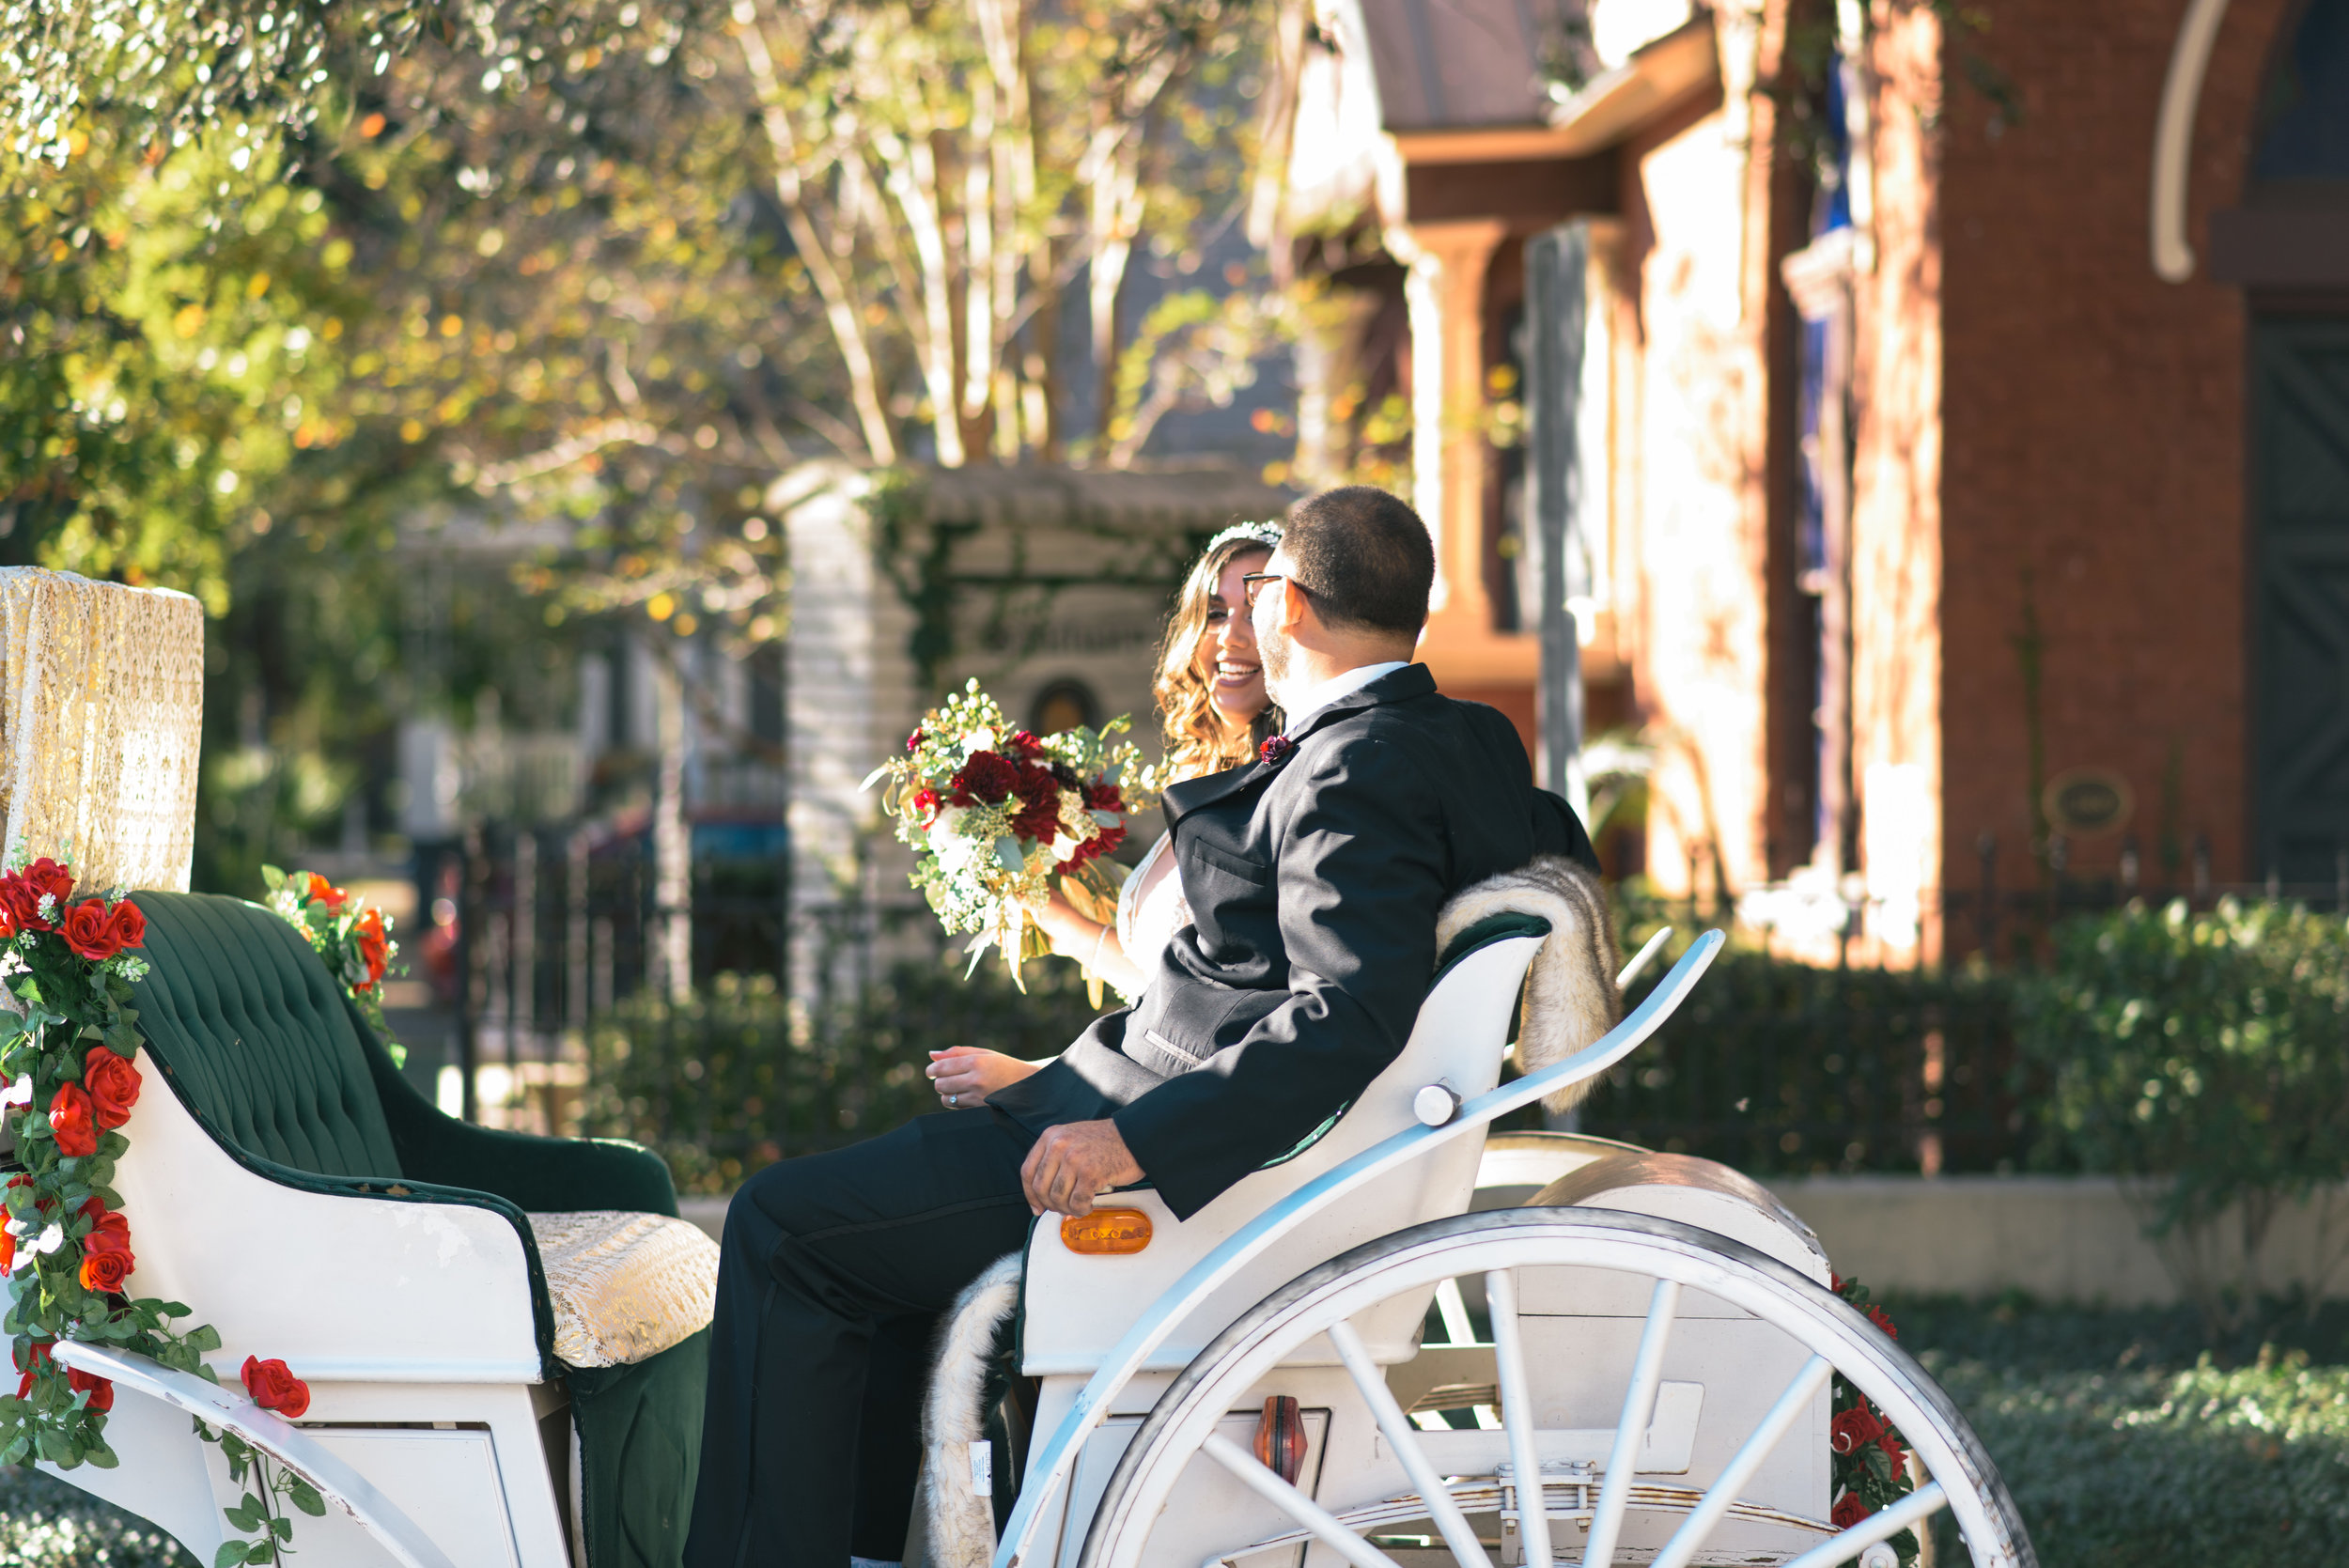 Iggy-and-yesenia-savannah-railroad-museum-wedding-meg-hill-photo- (337 of 1037).jpg